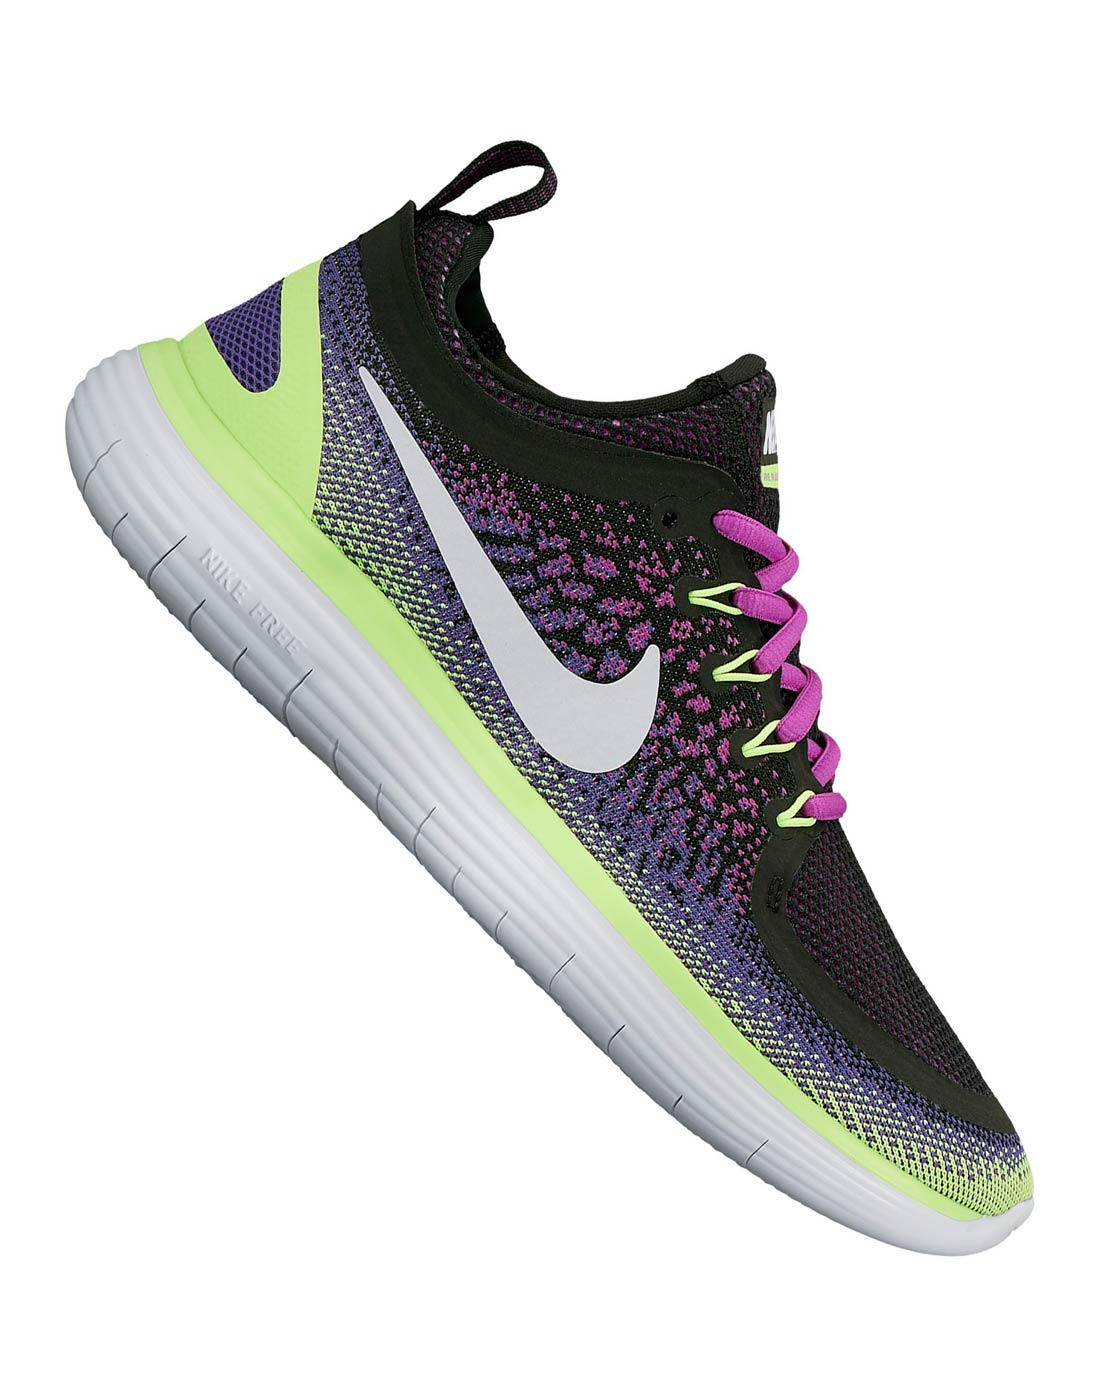 67c5e6e16ce40 Nike. Womens Free Run Distance. Womens Free Run Distance ...